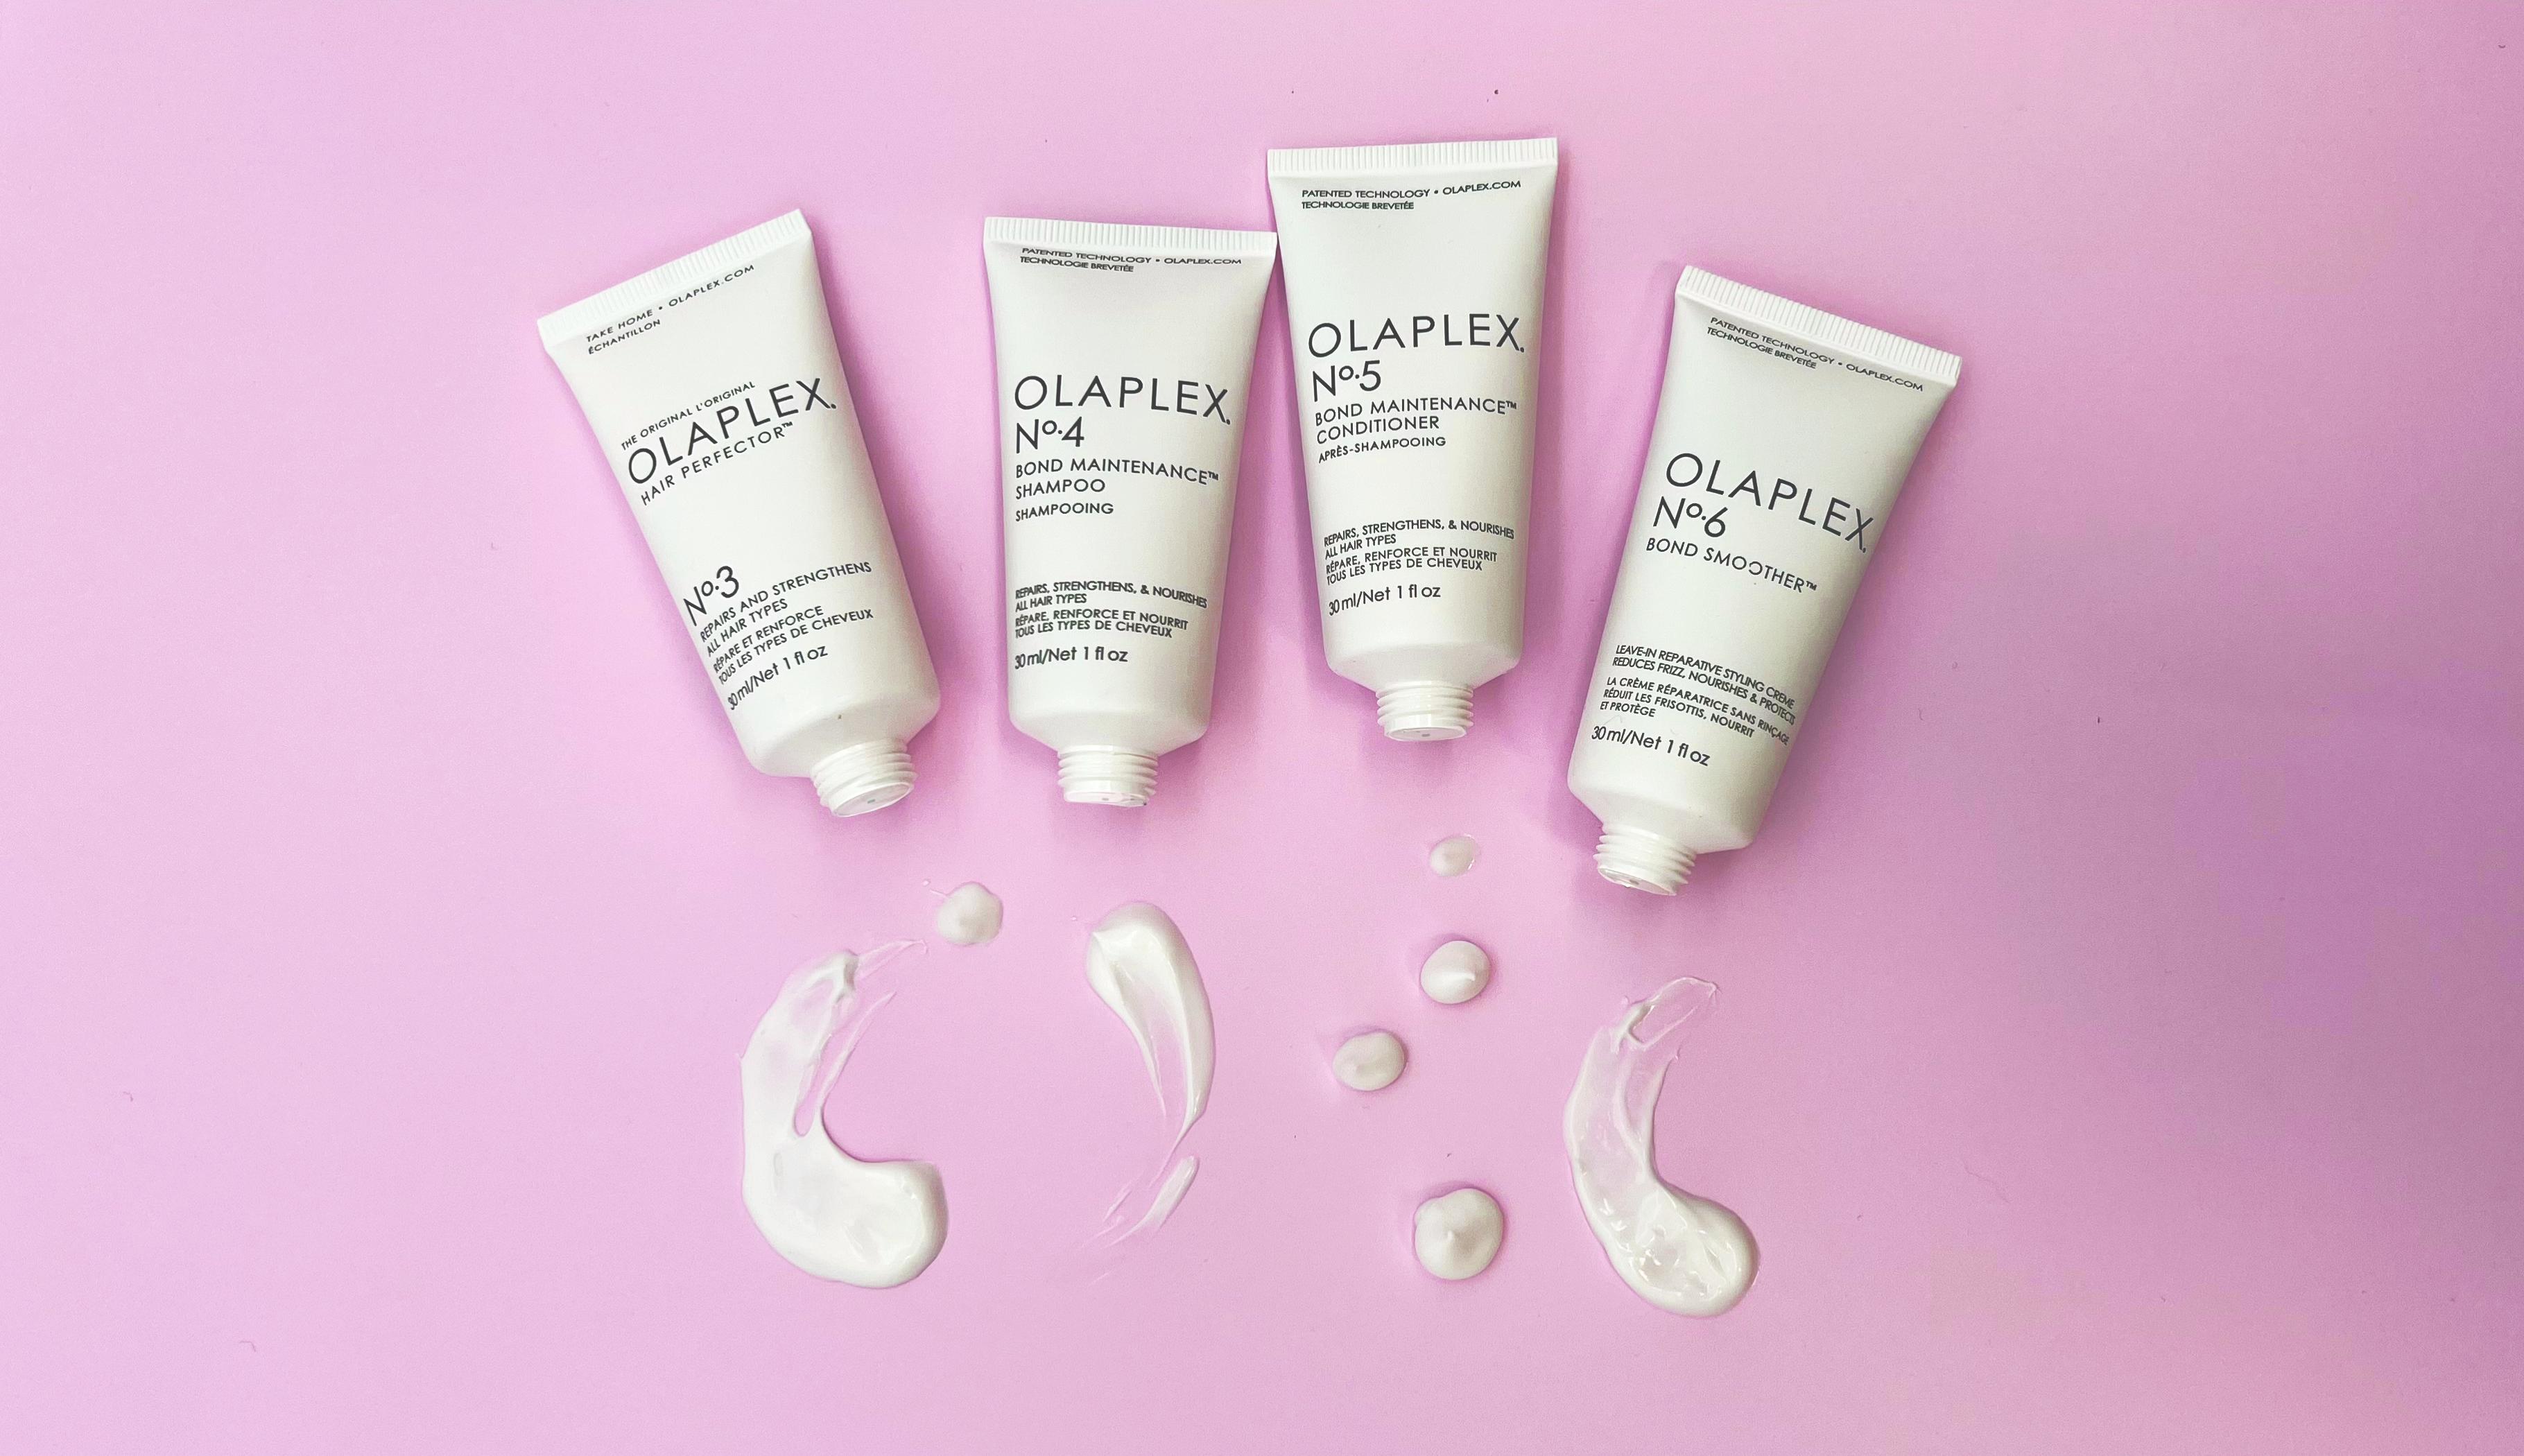 Olaplex - Fantastisk patentereret og banebrydende teknologi til dit hår